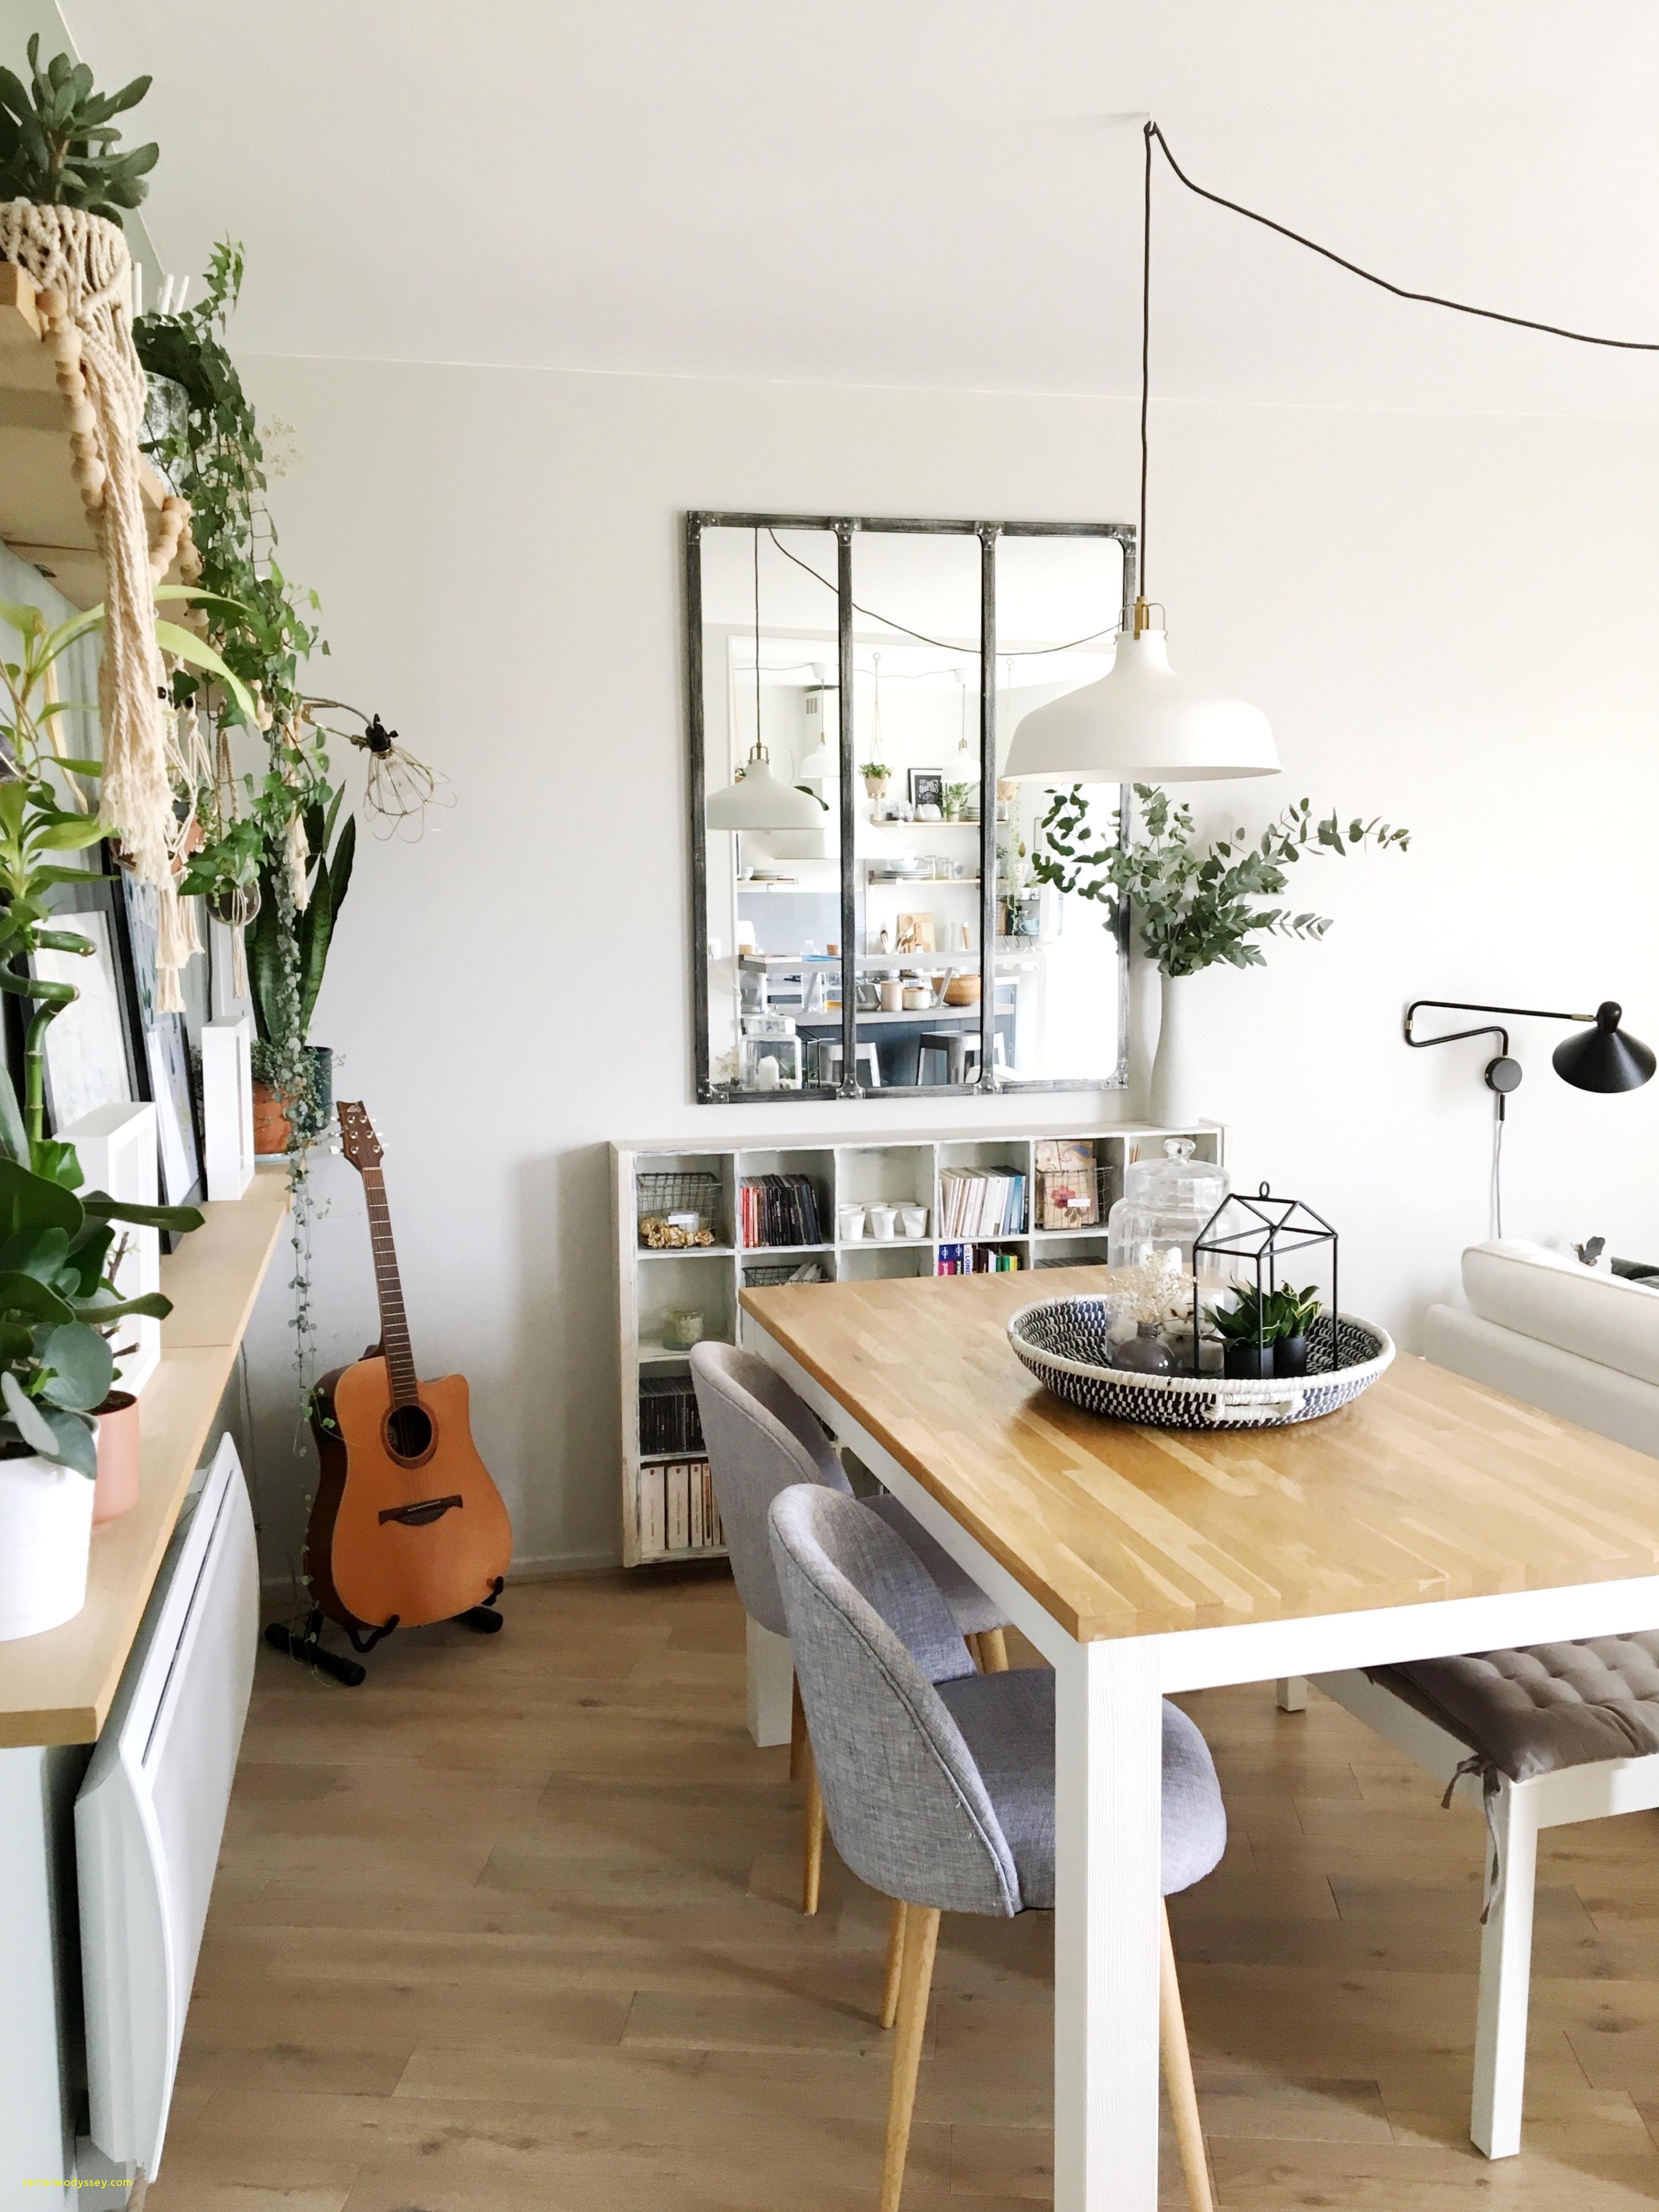 Table salle a manger scandinave en verre - pearlfection.fr